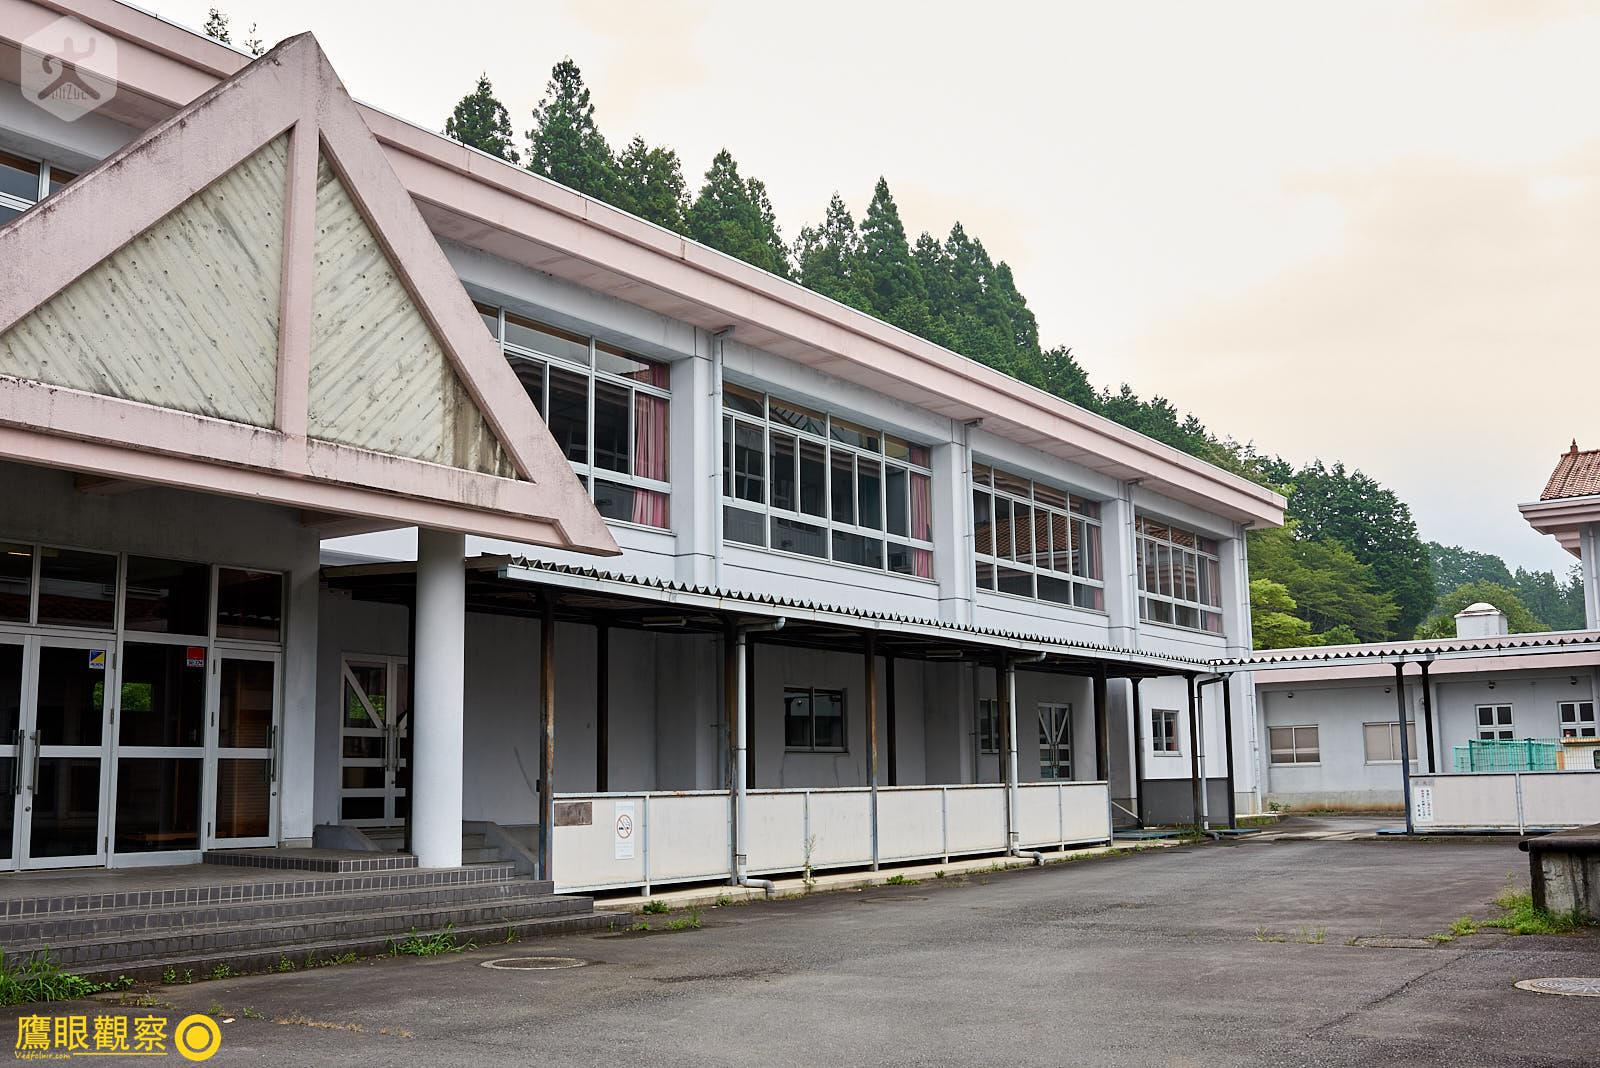 Japan Travel Kanuma Shiritsu Kuga Elementary School 20190818045018 日本廢棄小學 🚗 RV 休旅車露營、森林探險之旅(櫪木縣鹿沼市立久我小學)🇯🇵⛺️